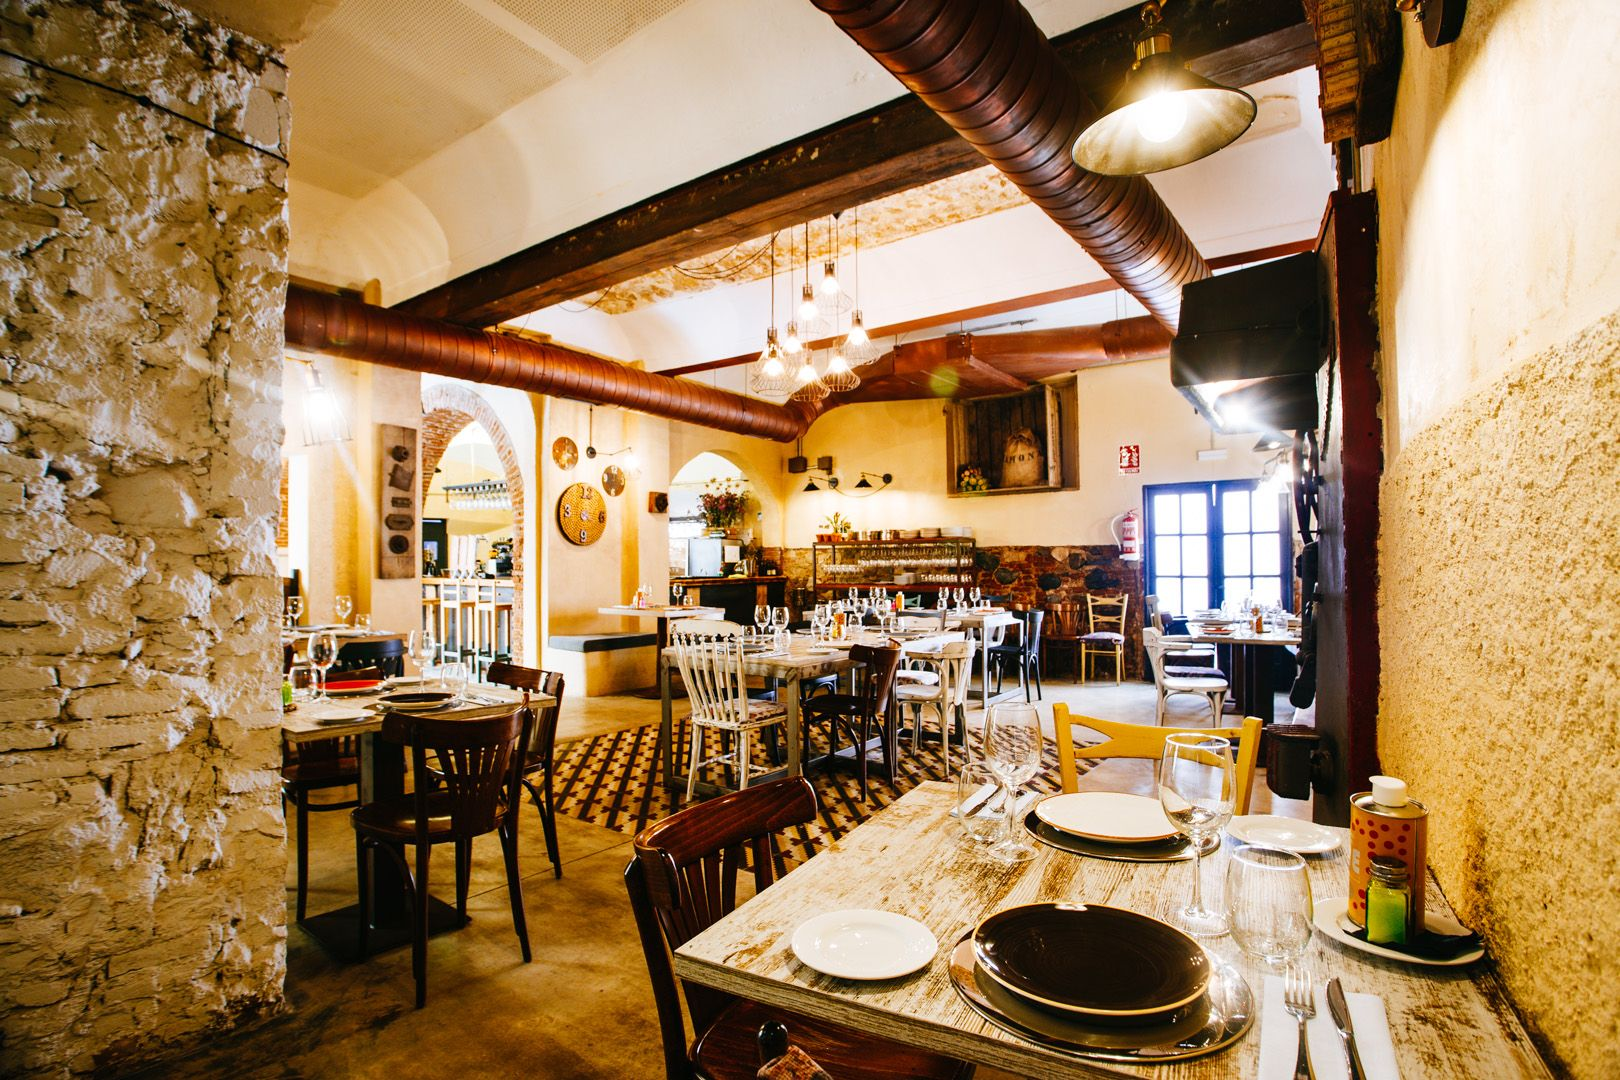 Restaurante de comida casera en Mérida